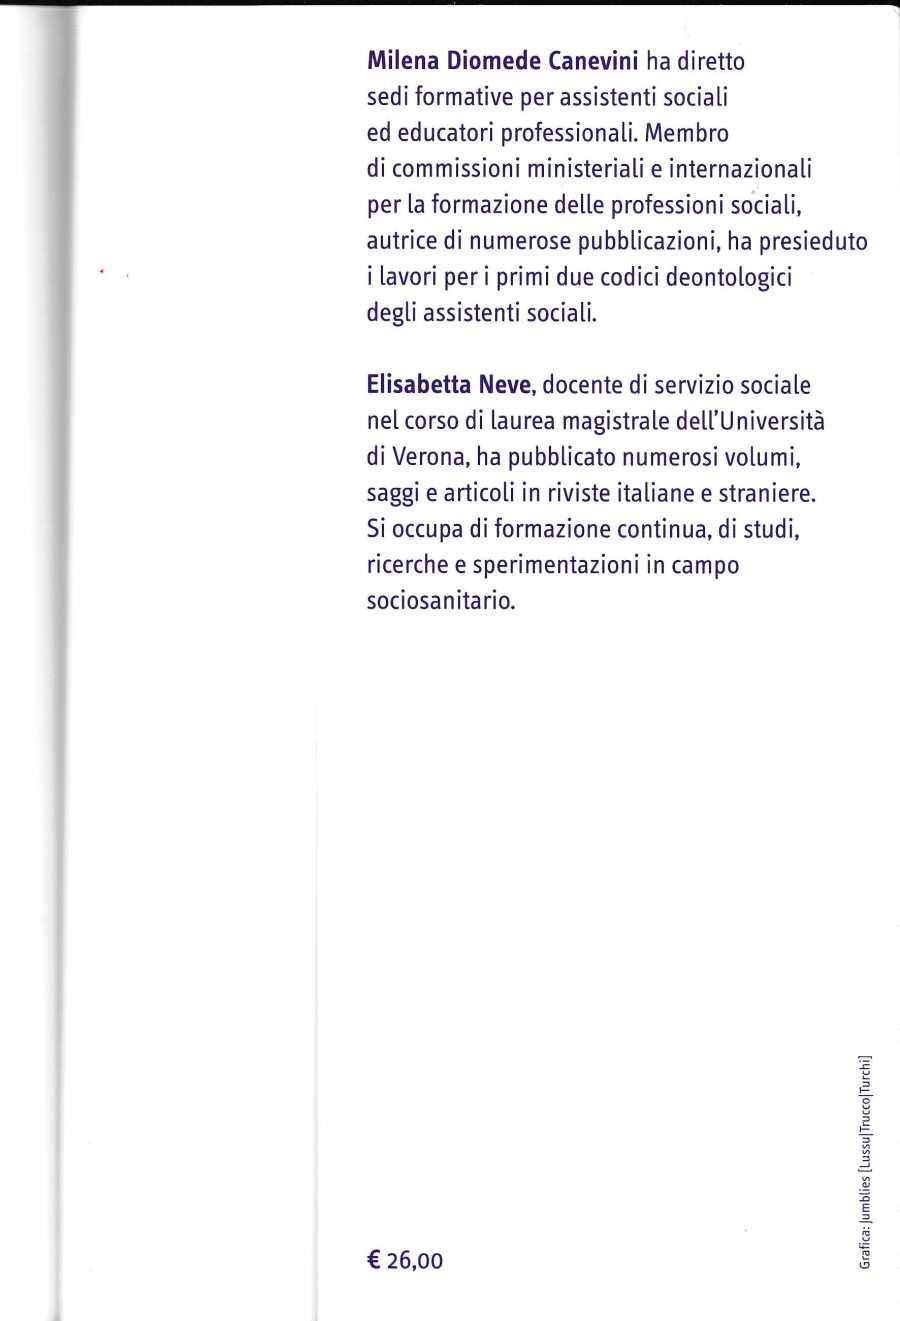 CANEVINI DEONTLOGIA2618